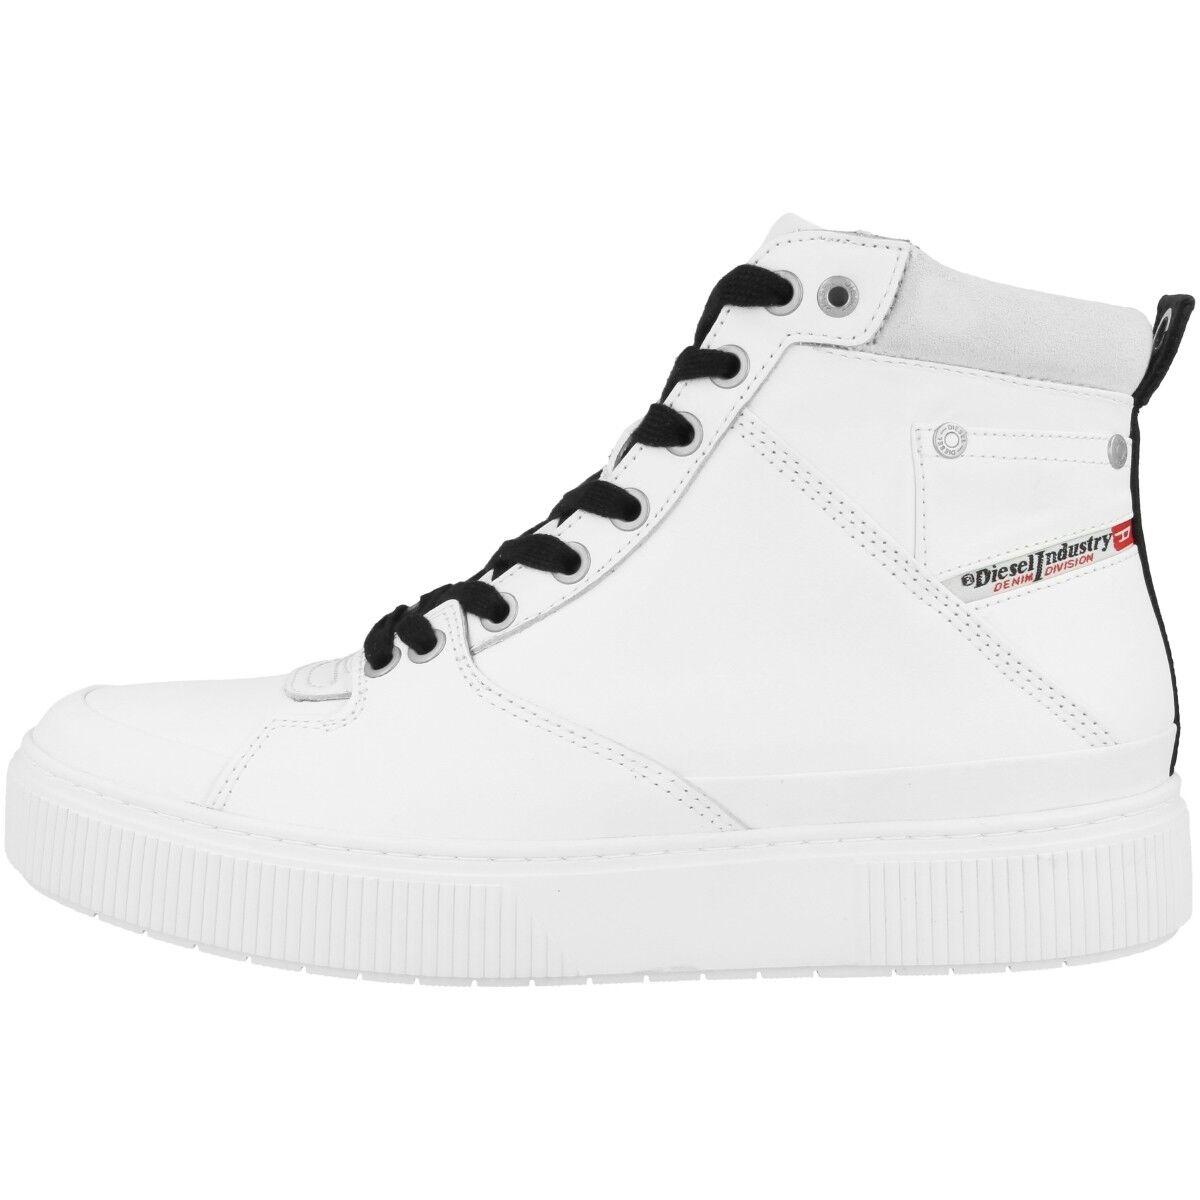 Diesel s-Danny mc shoes retro casual sneakers high top y01797-pr131-t1015